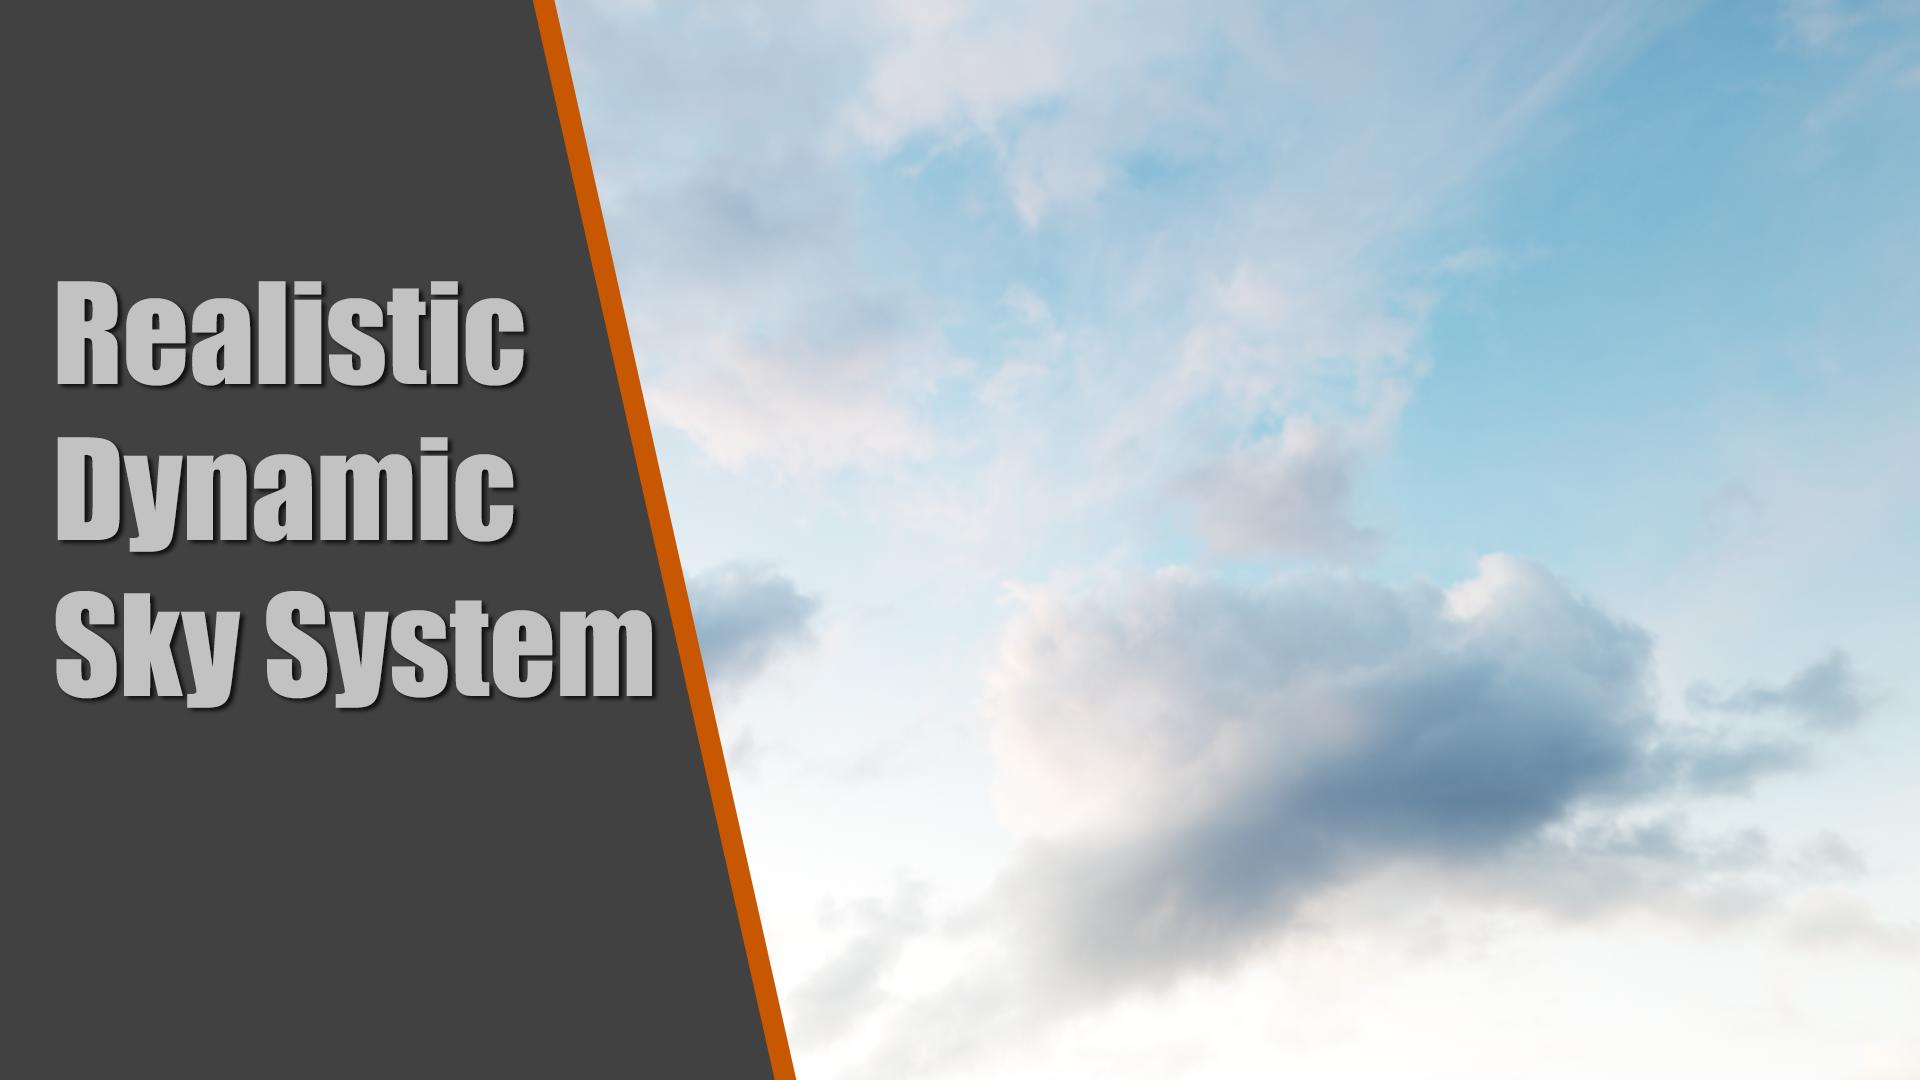 Realistic Dynamic Sky System by Artyom Cheremisin in